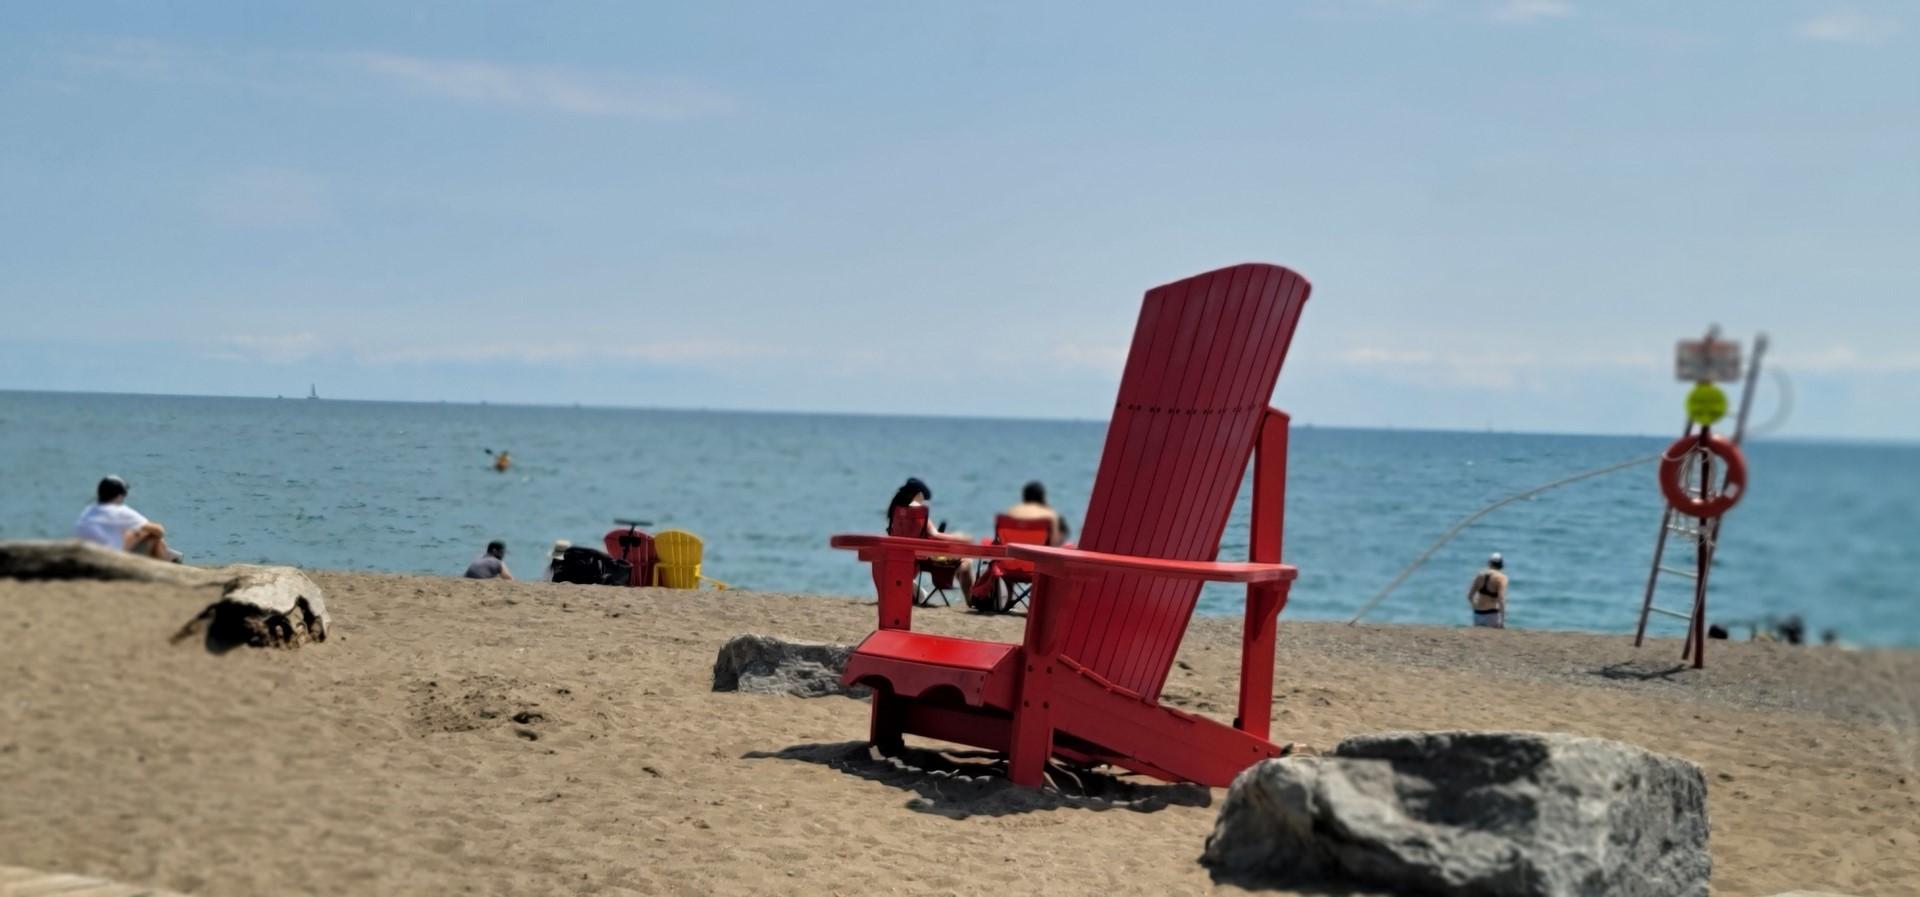 red chair in beaches toronto neighbourhood